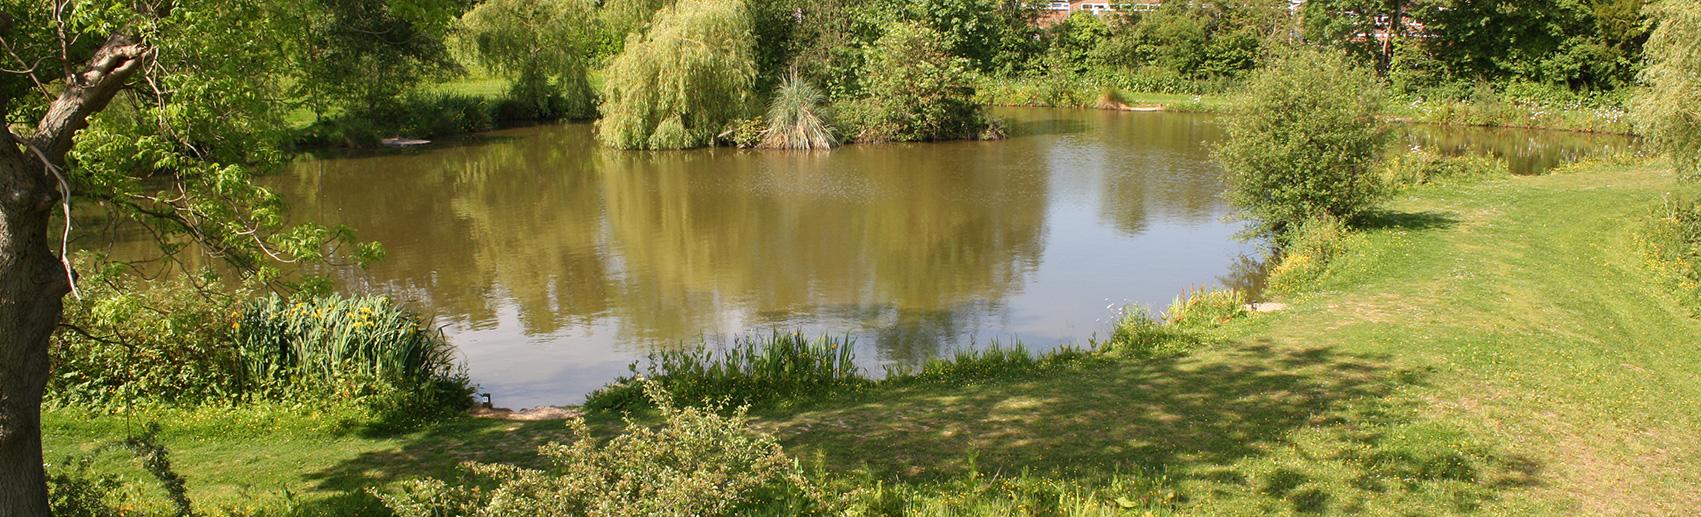 paddock fishing lake - newdigate farms estate